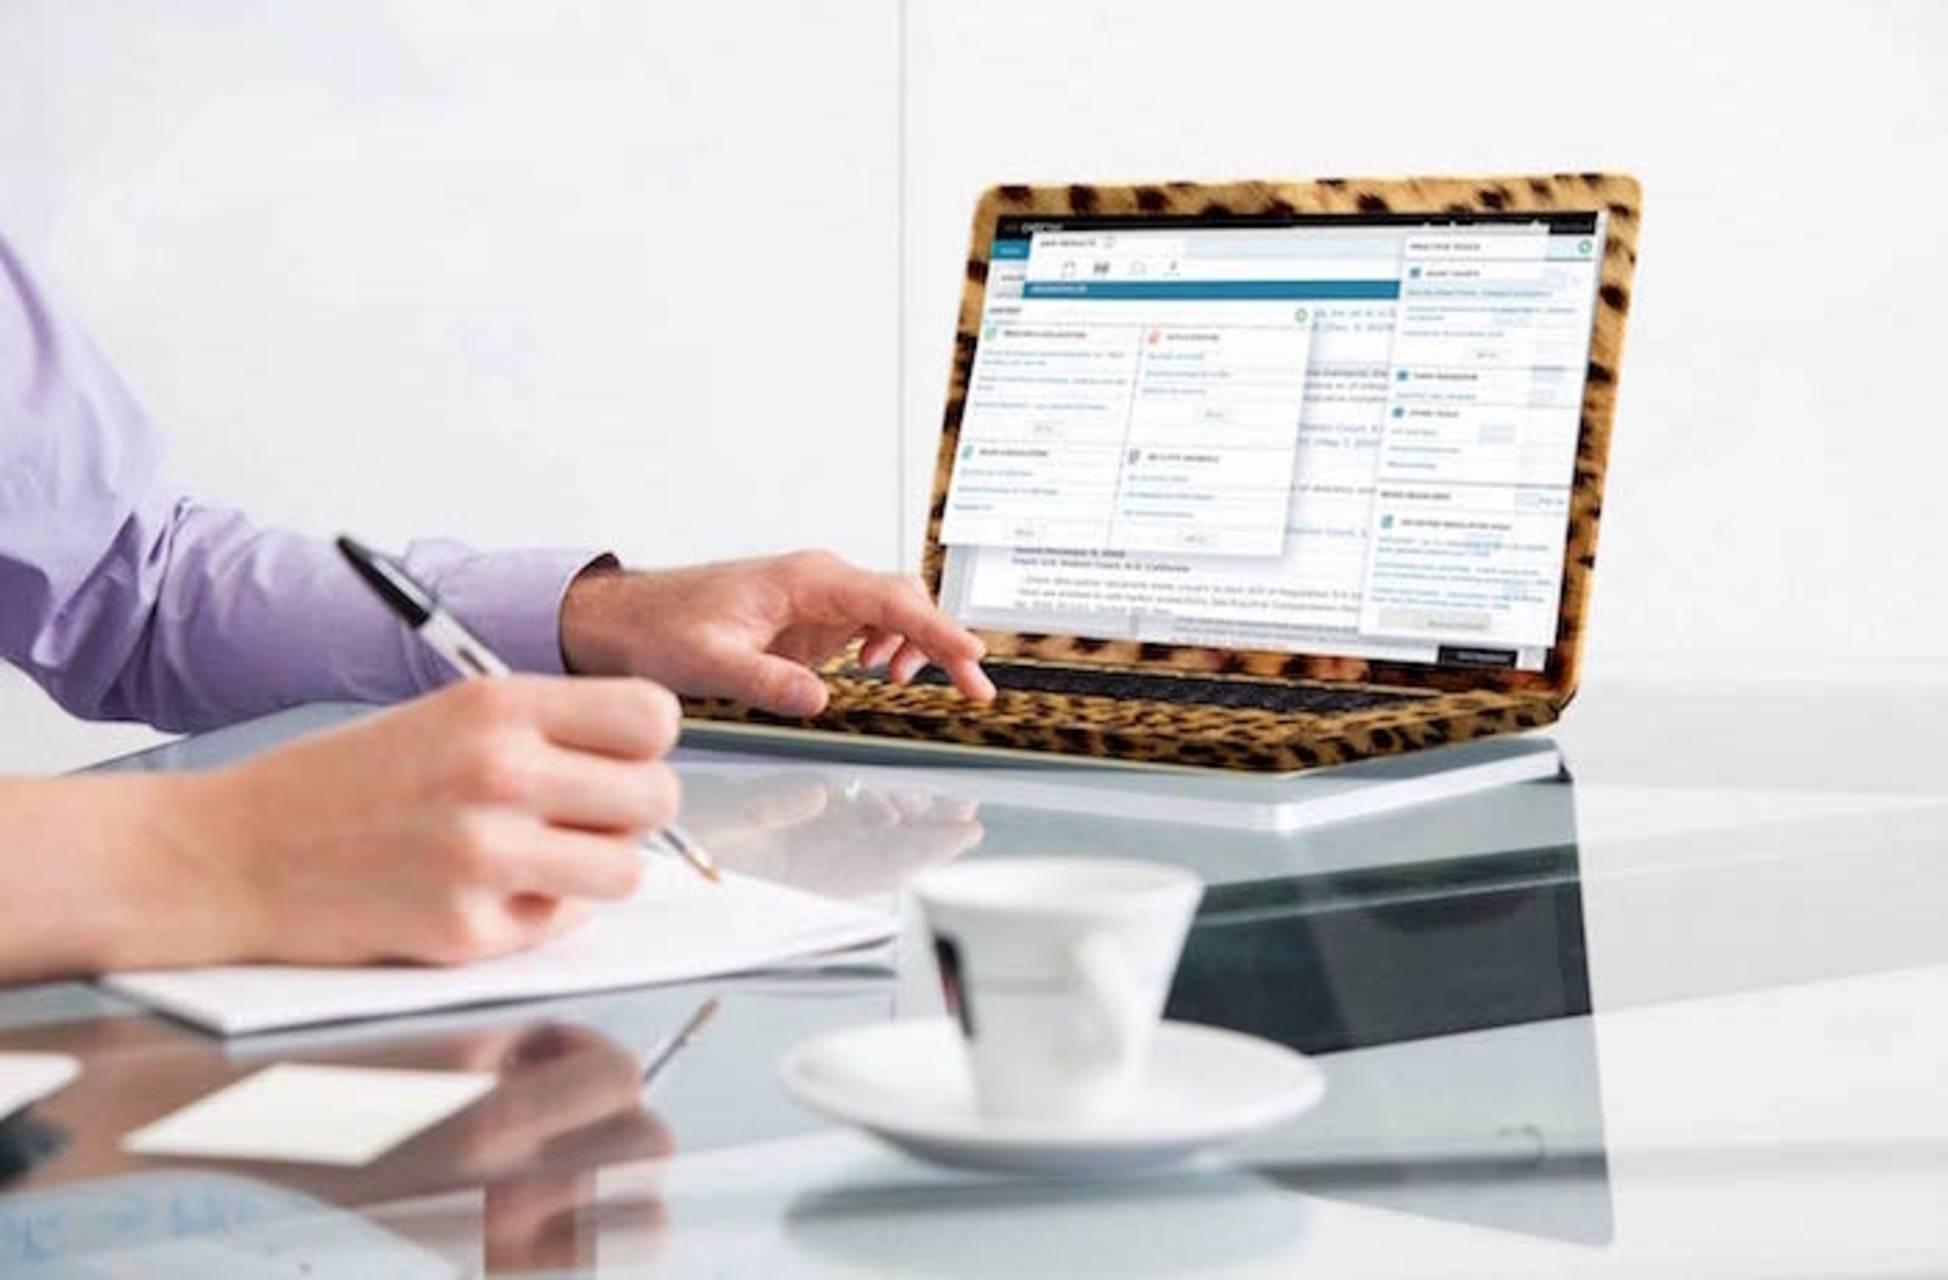 cheetahcampaign_laptop